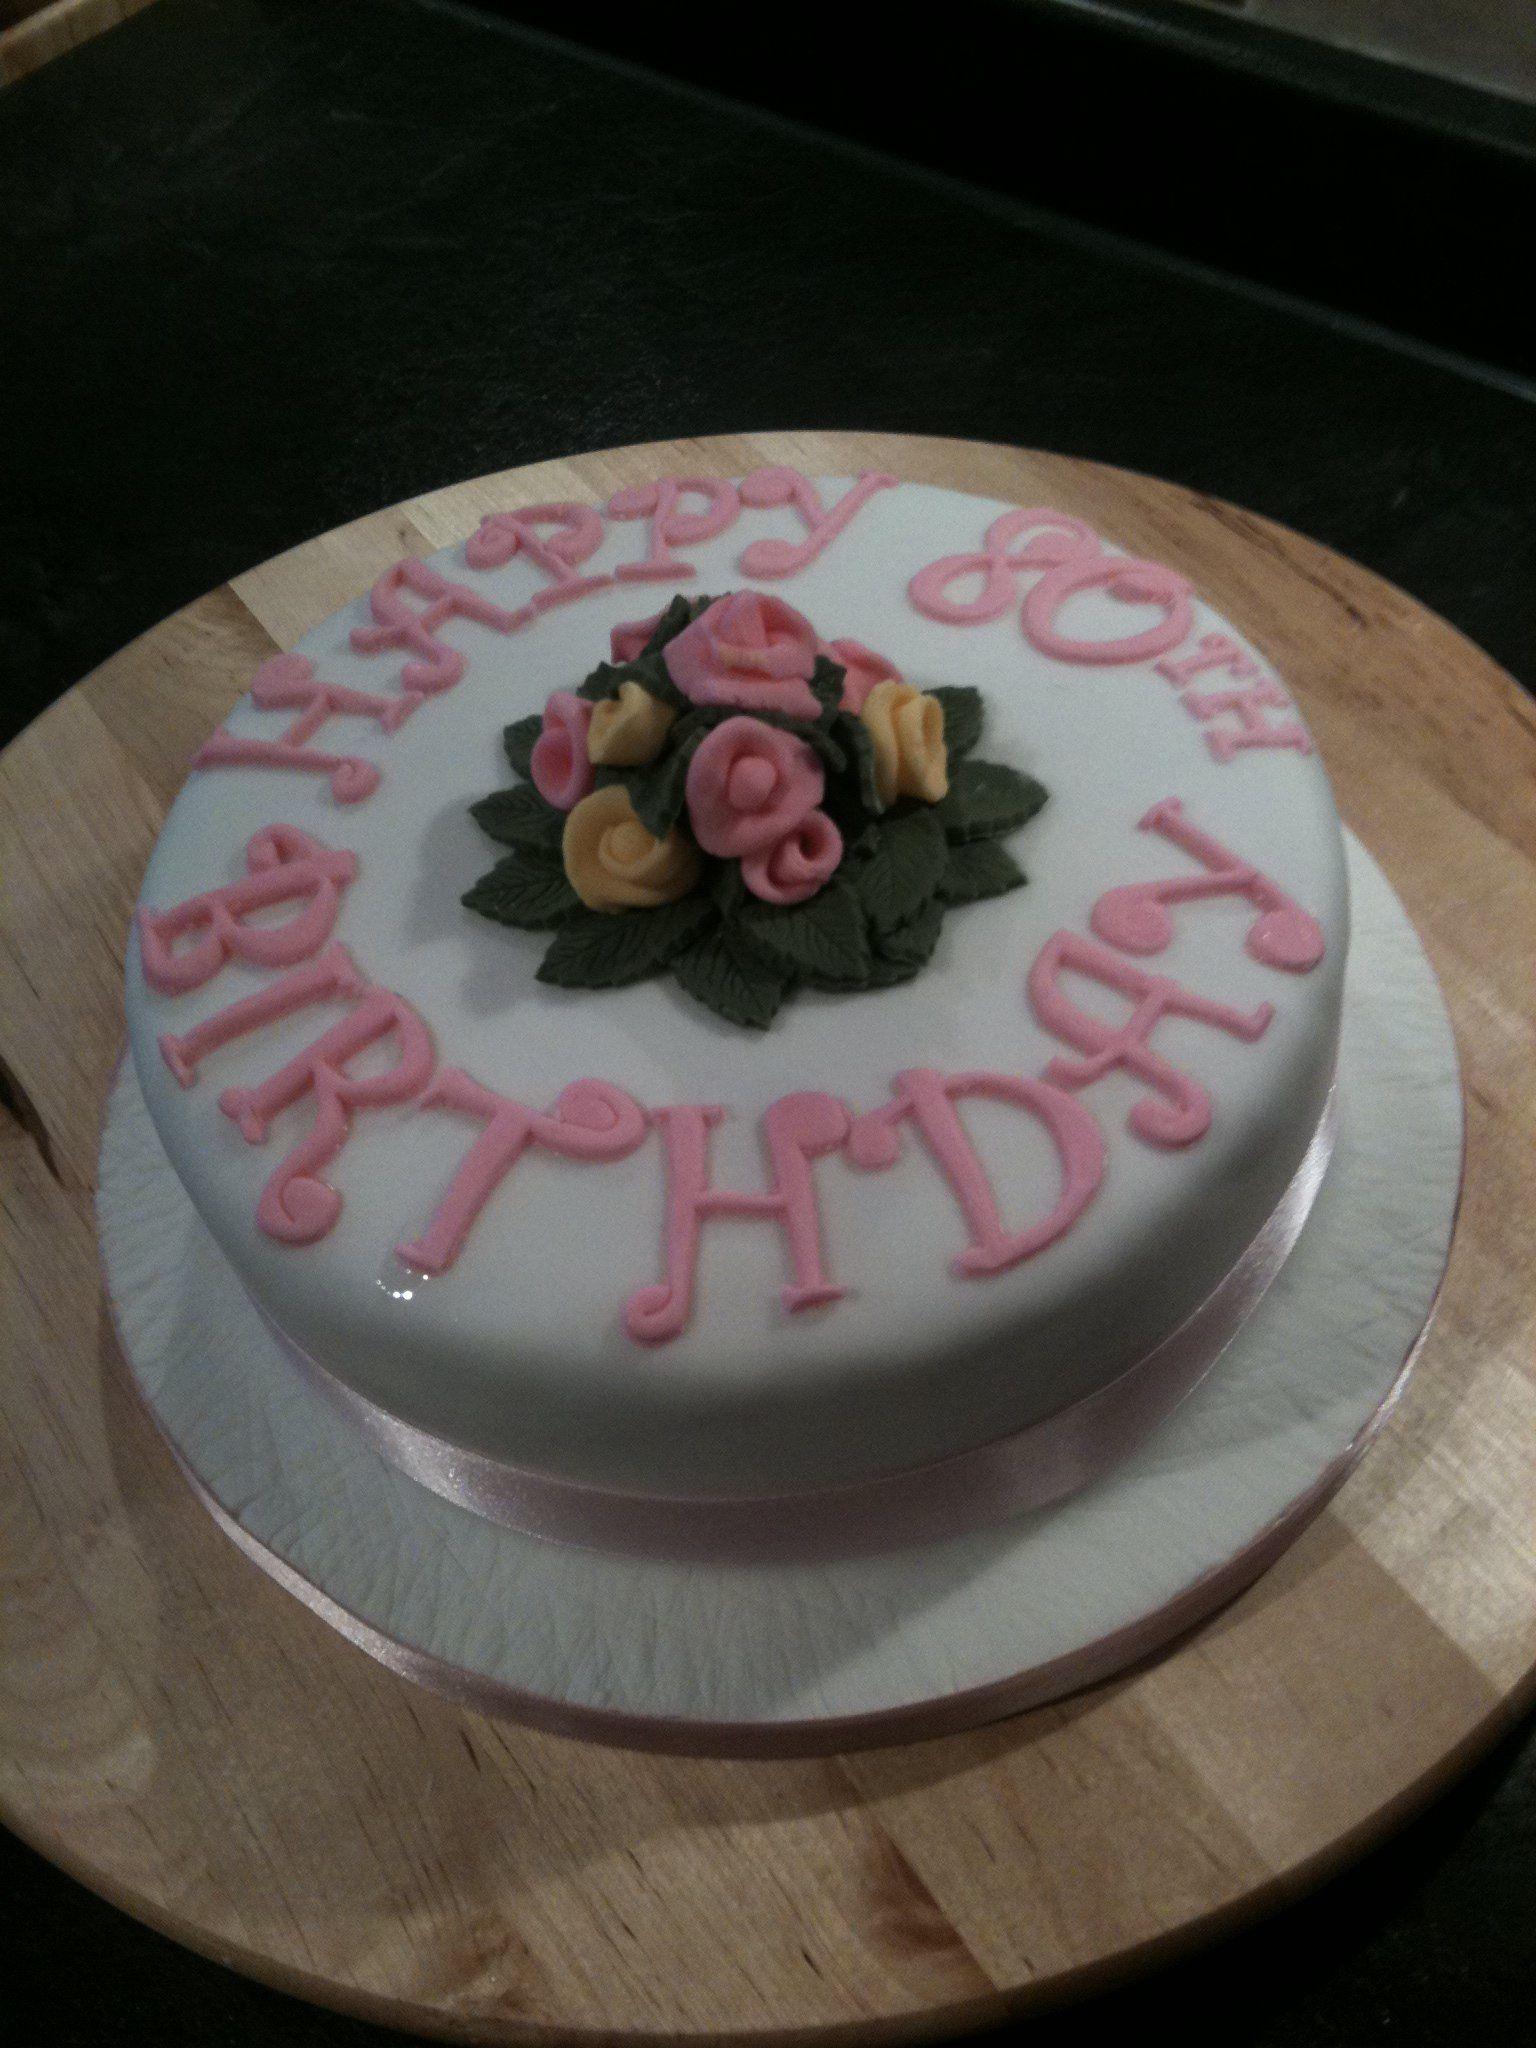 Small Images Of Birthday Cake : Small round flowers birthday cake My Cakes Pinterest